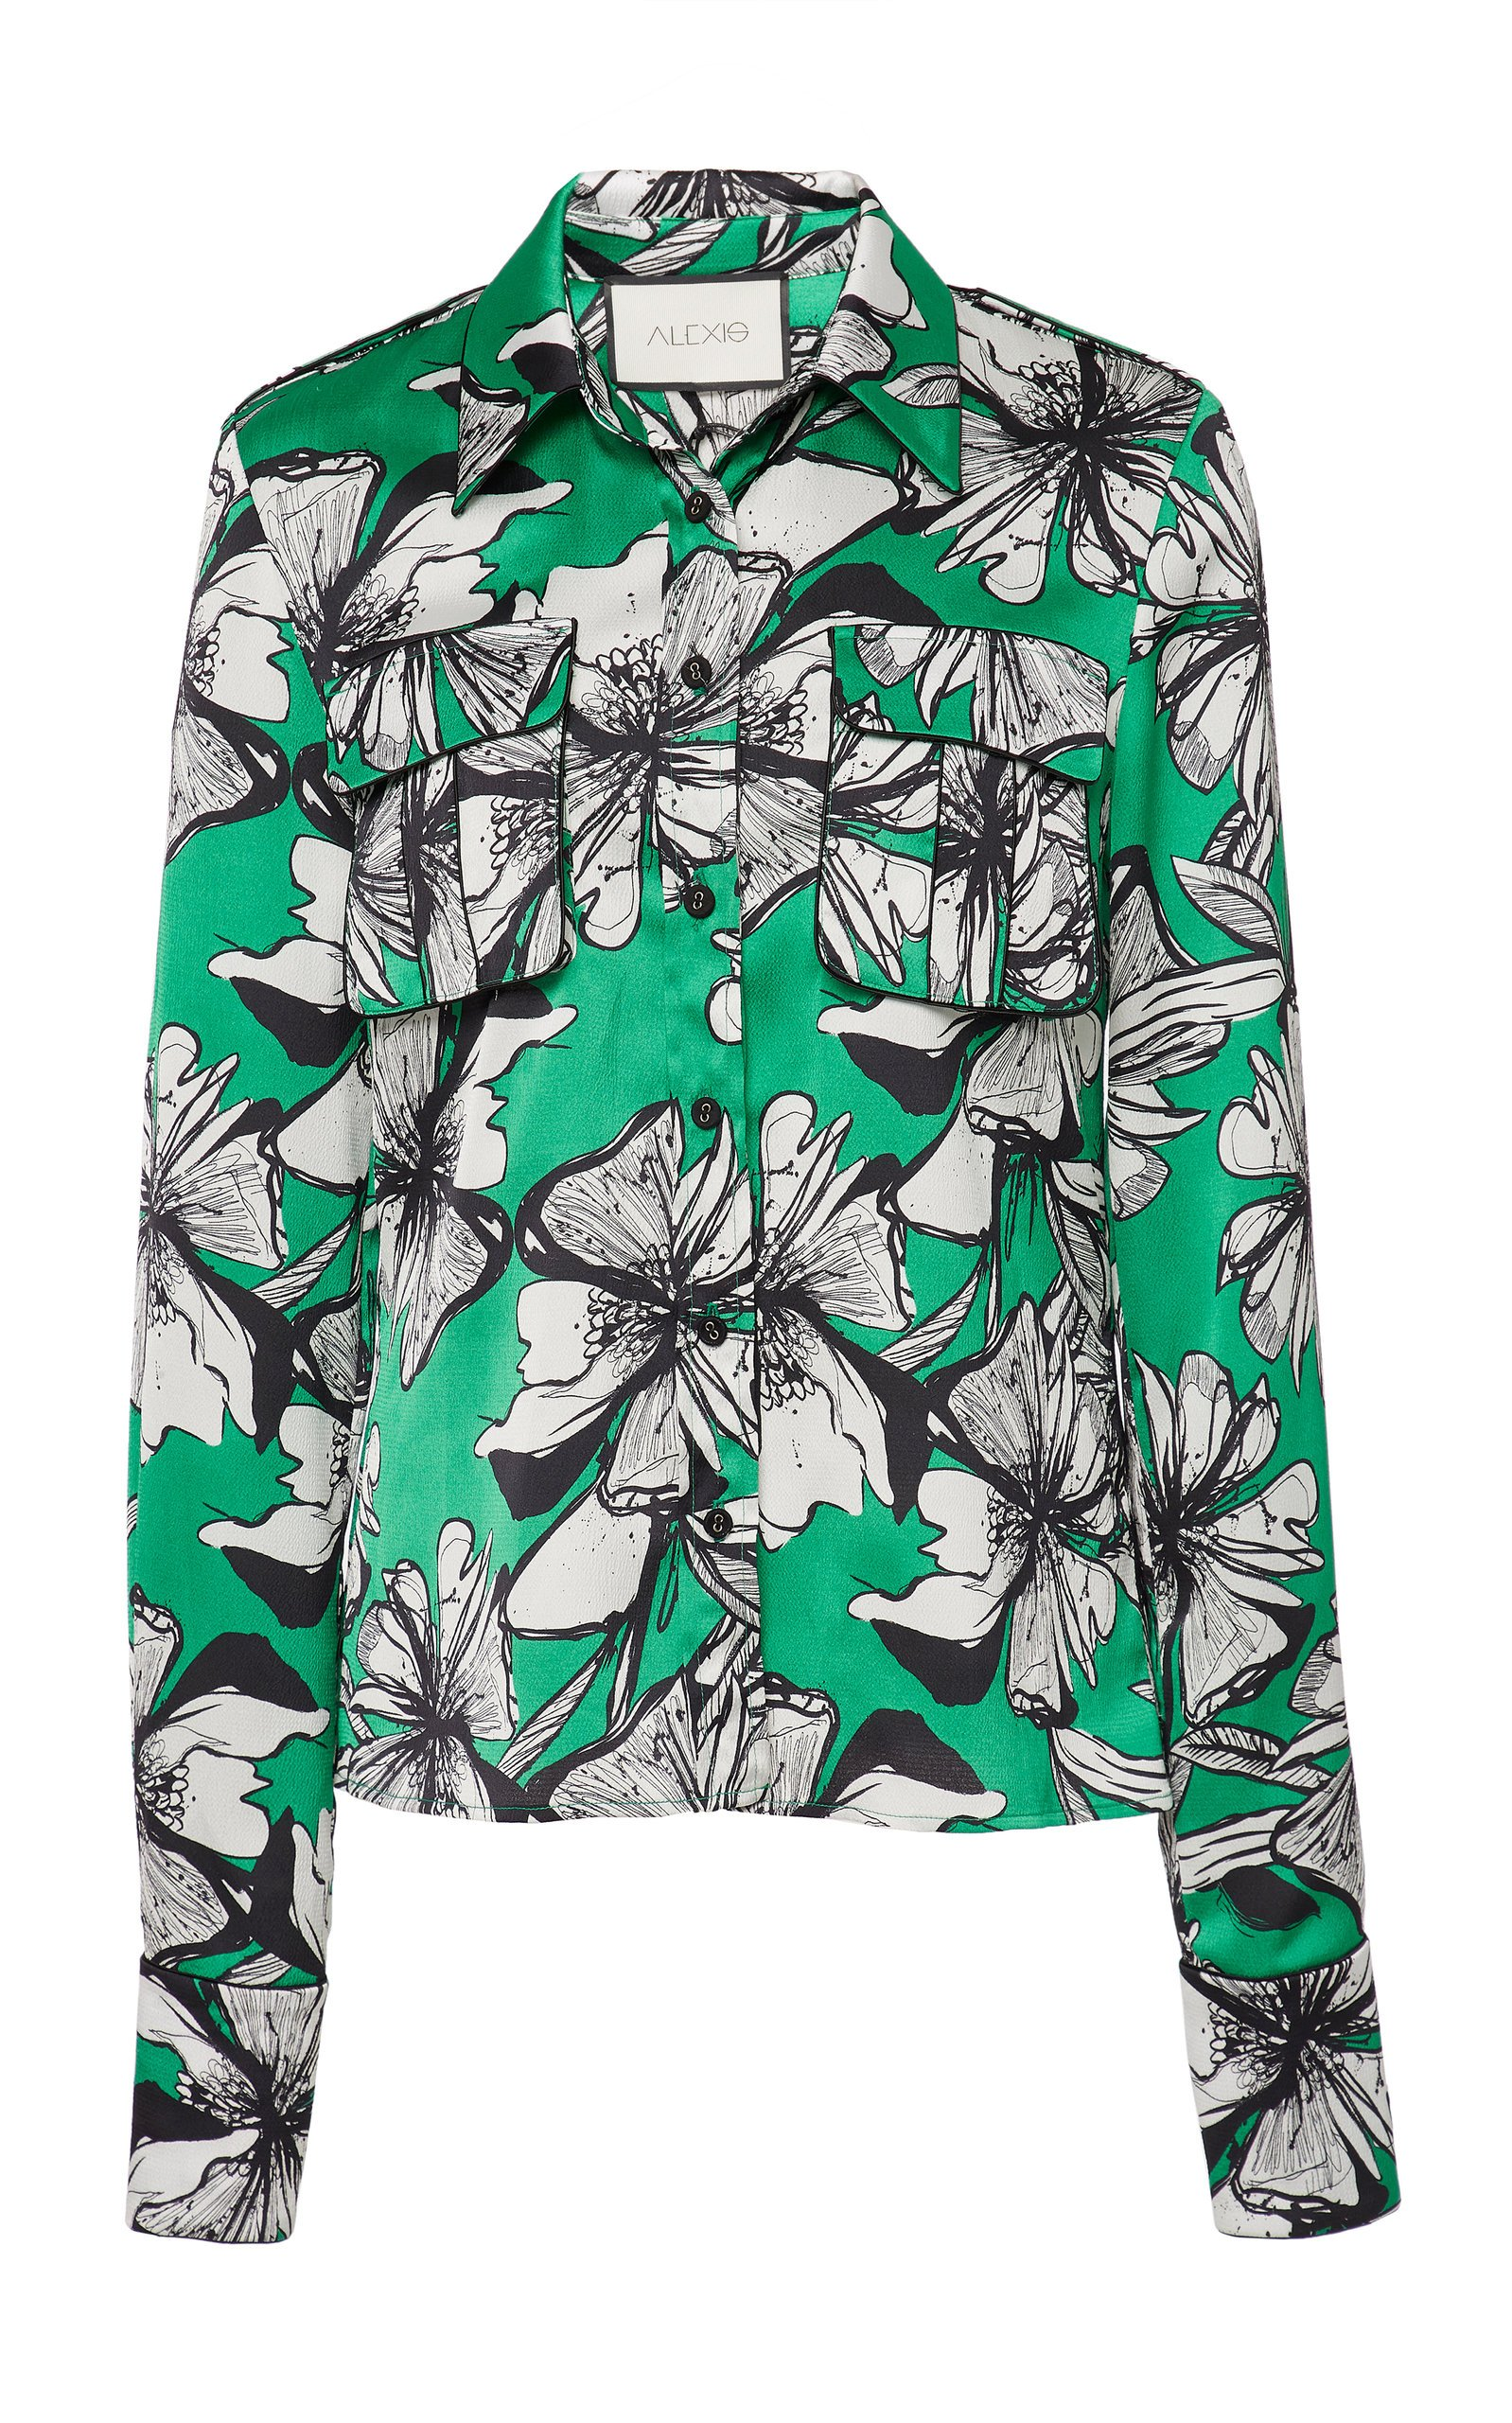 Slyvies Floral Print Satin Shirt By Alexis | Moda Operandi